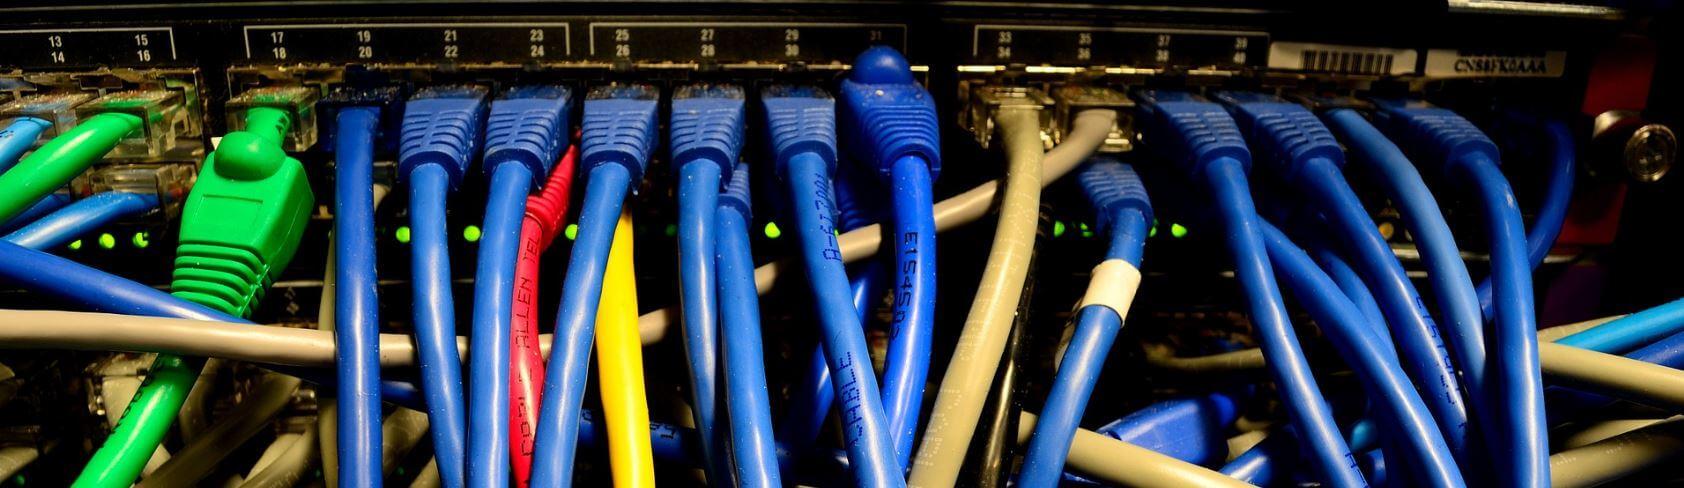 computerkauf ckeckliste ethernet kabelsalat